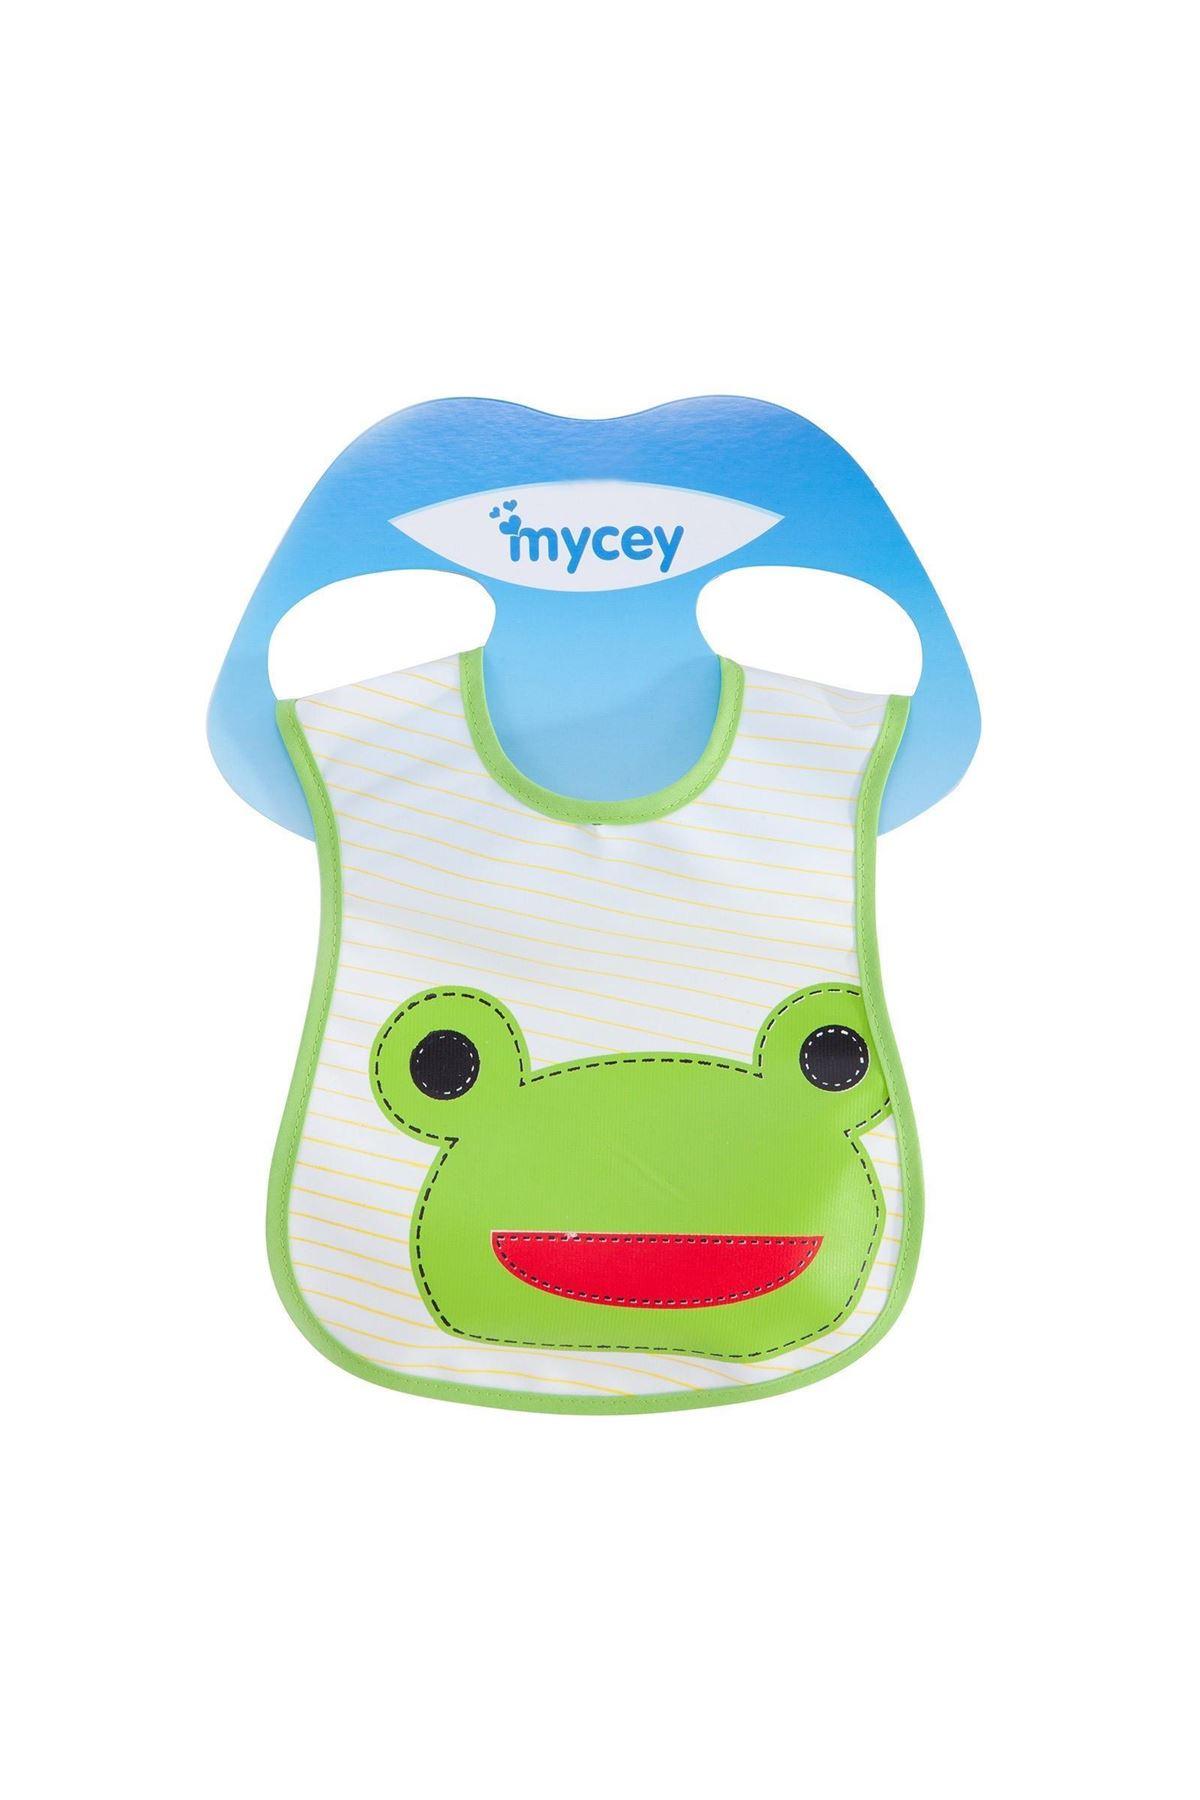 Mycey Leke Tutmaz Önlük Kurbağa